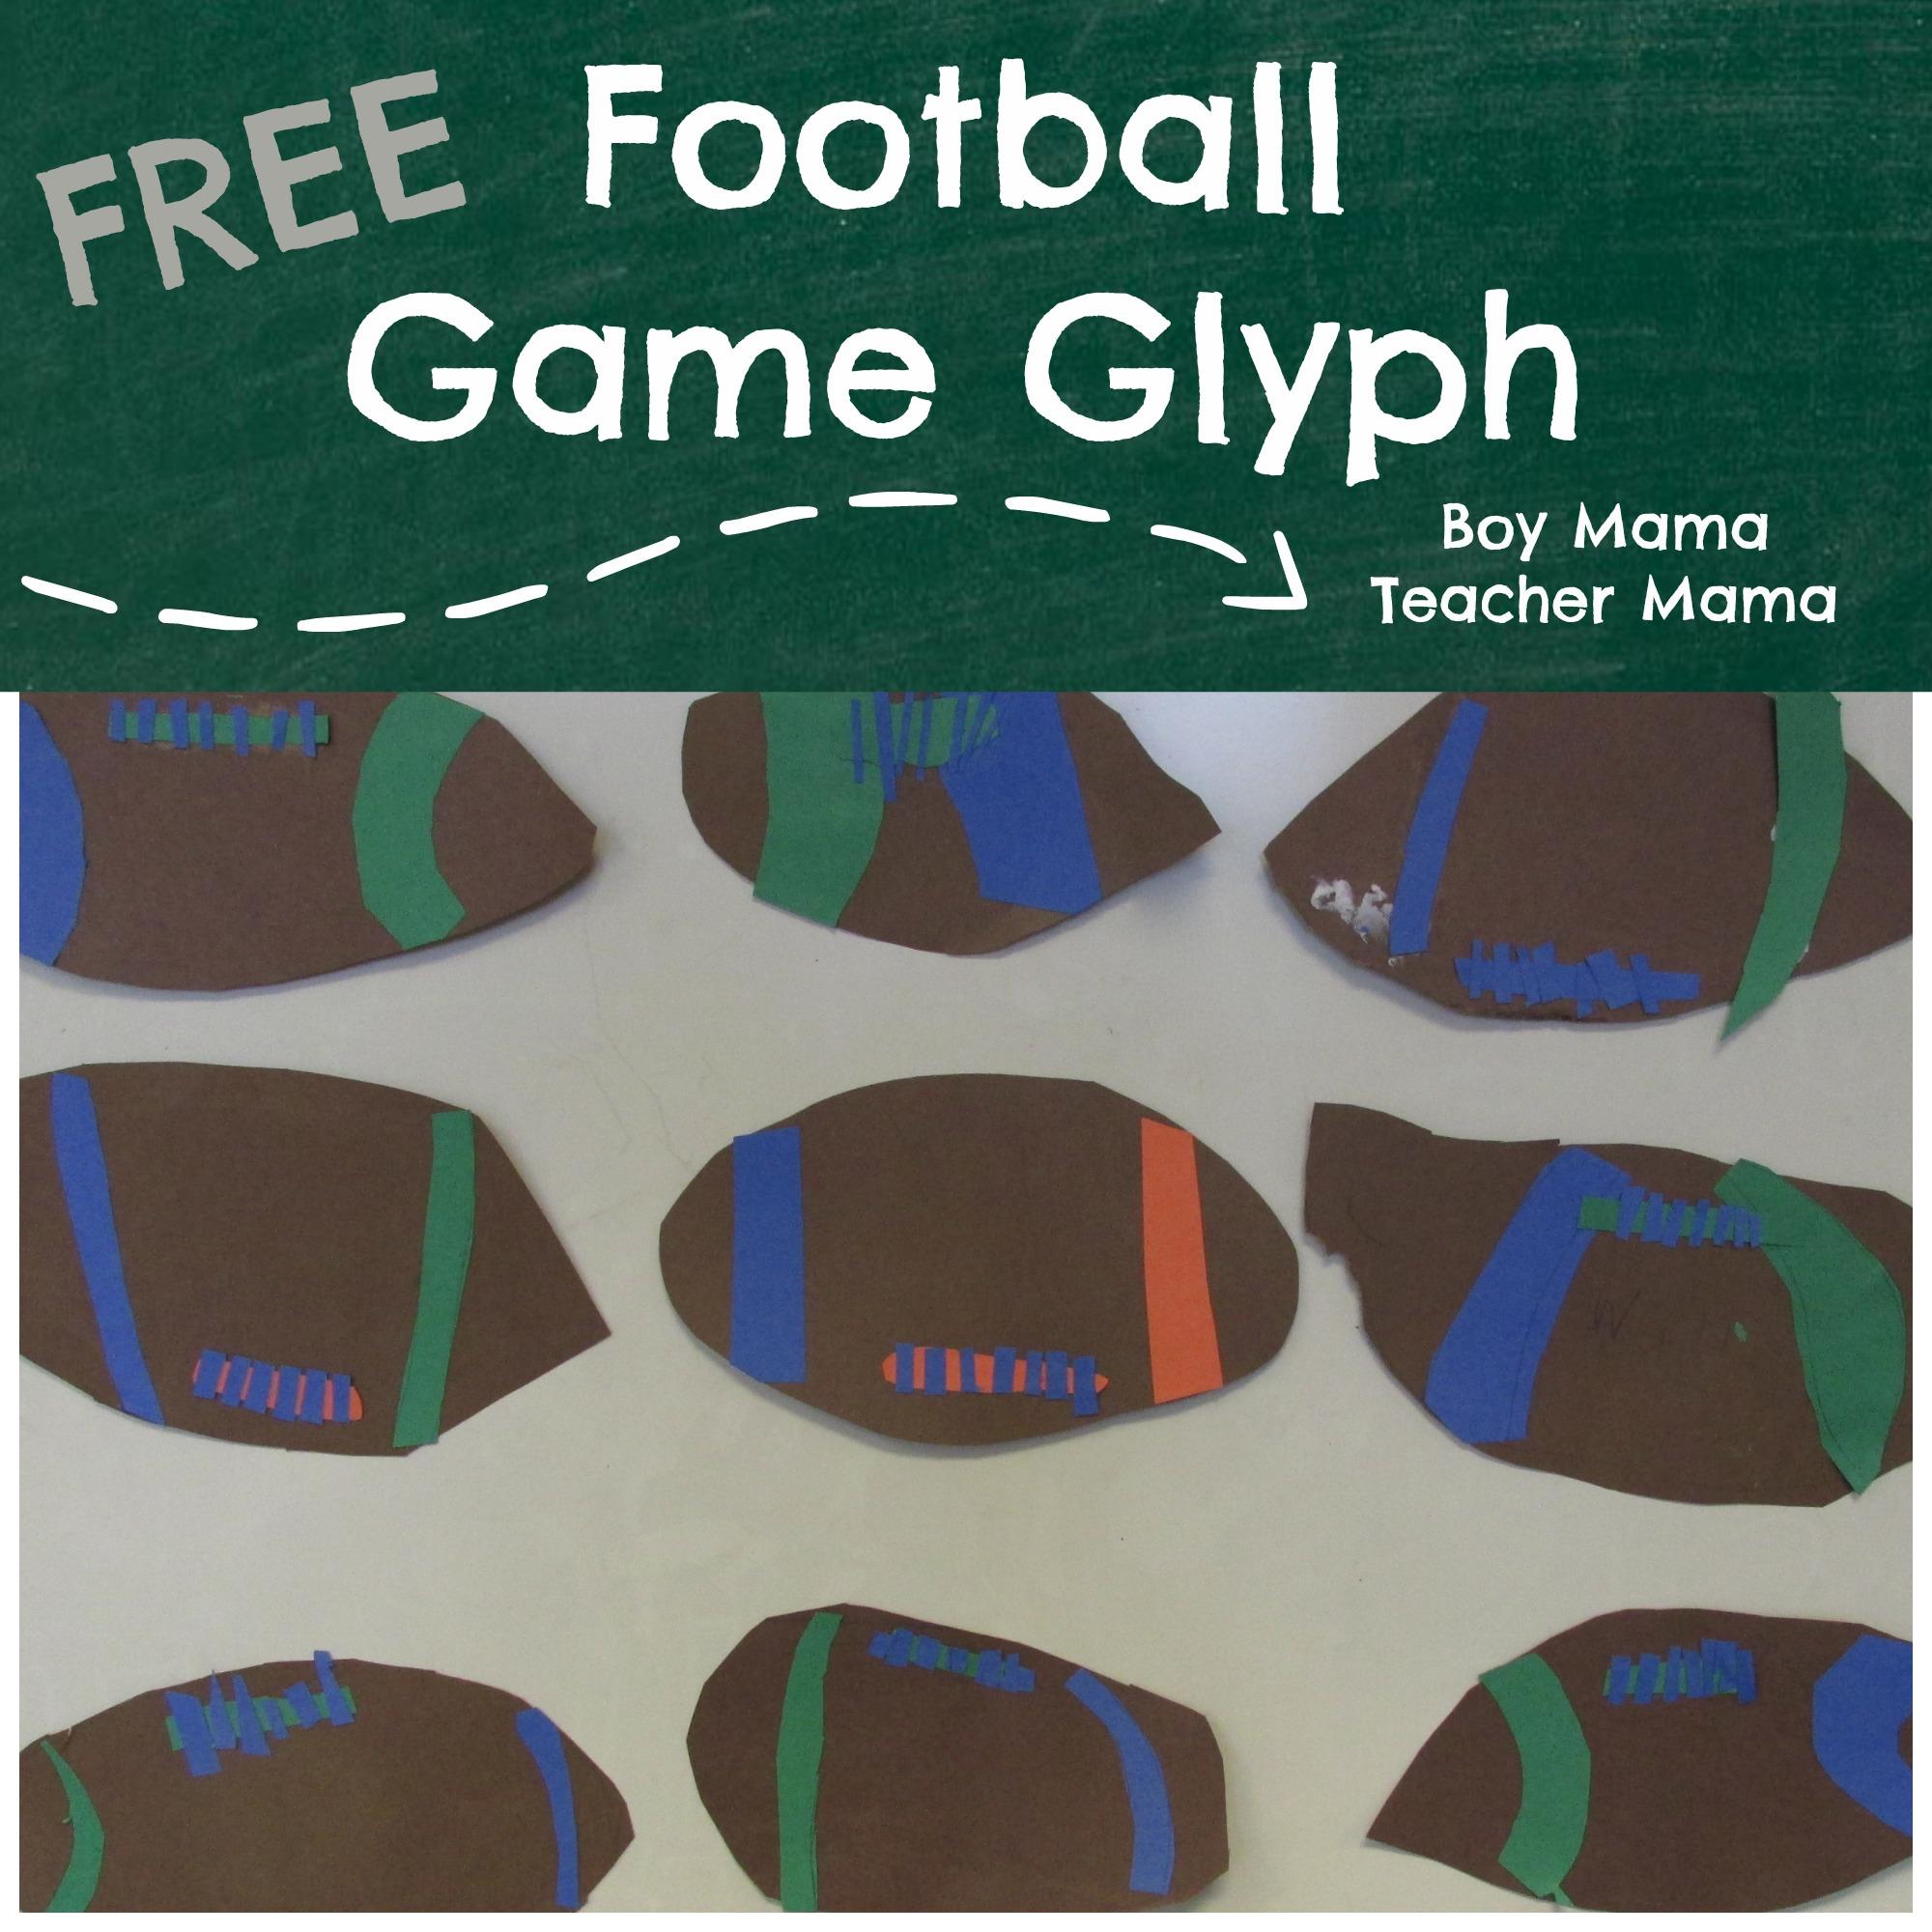 Boy Mama Teacher Mama Football Game Glyph FEatured